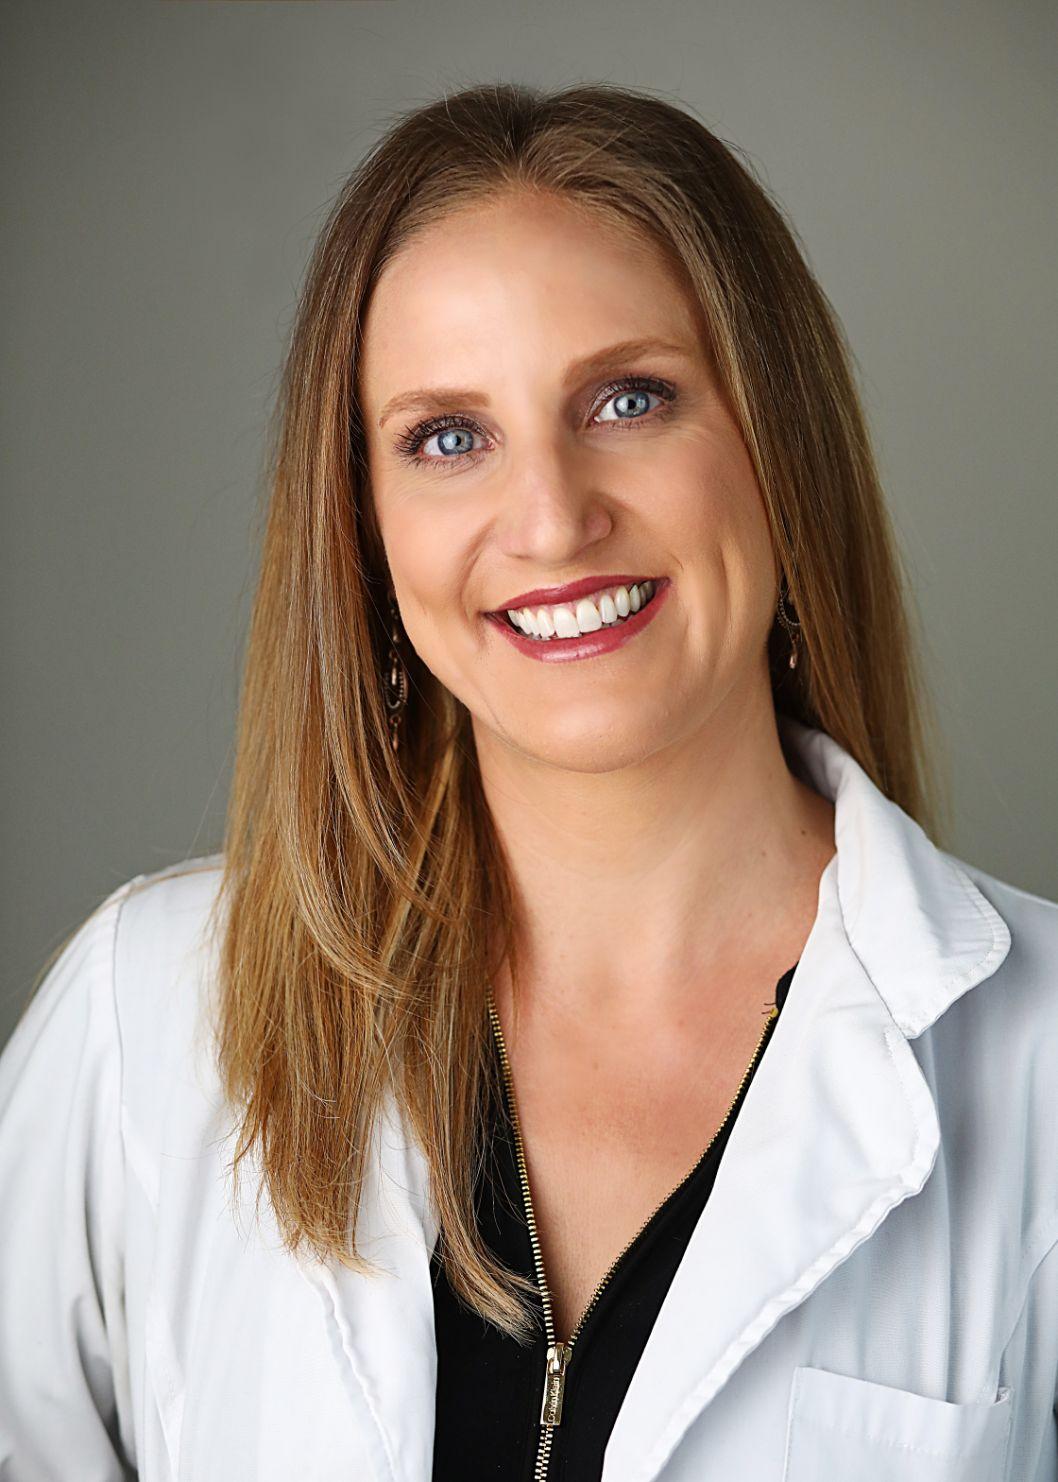 Sarah Packard Normand, RN, BSN, Owner